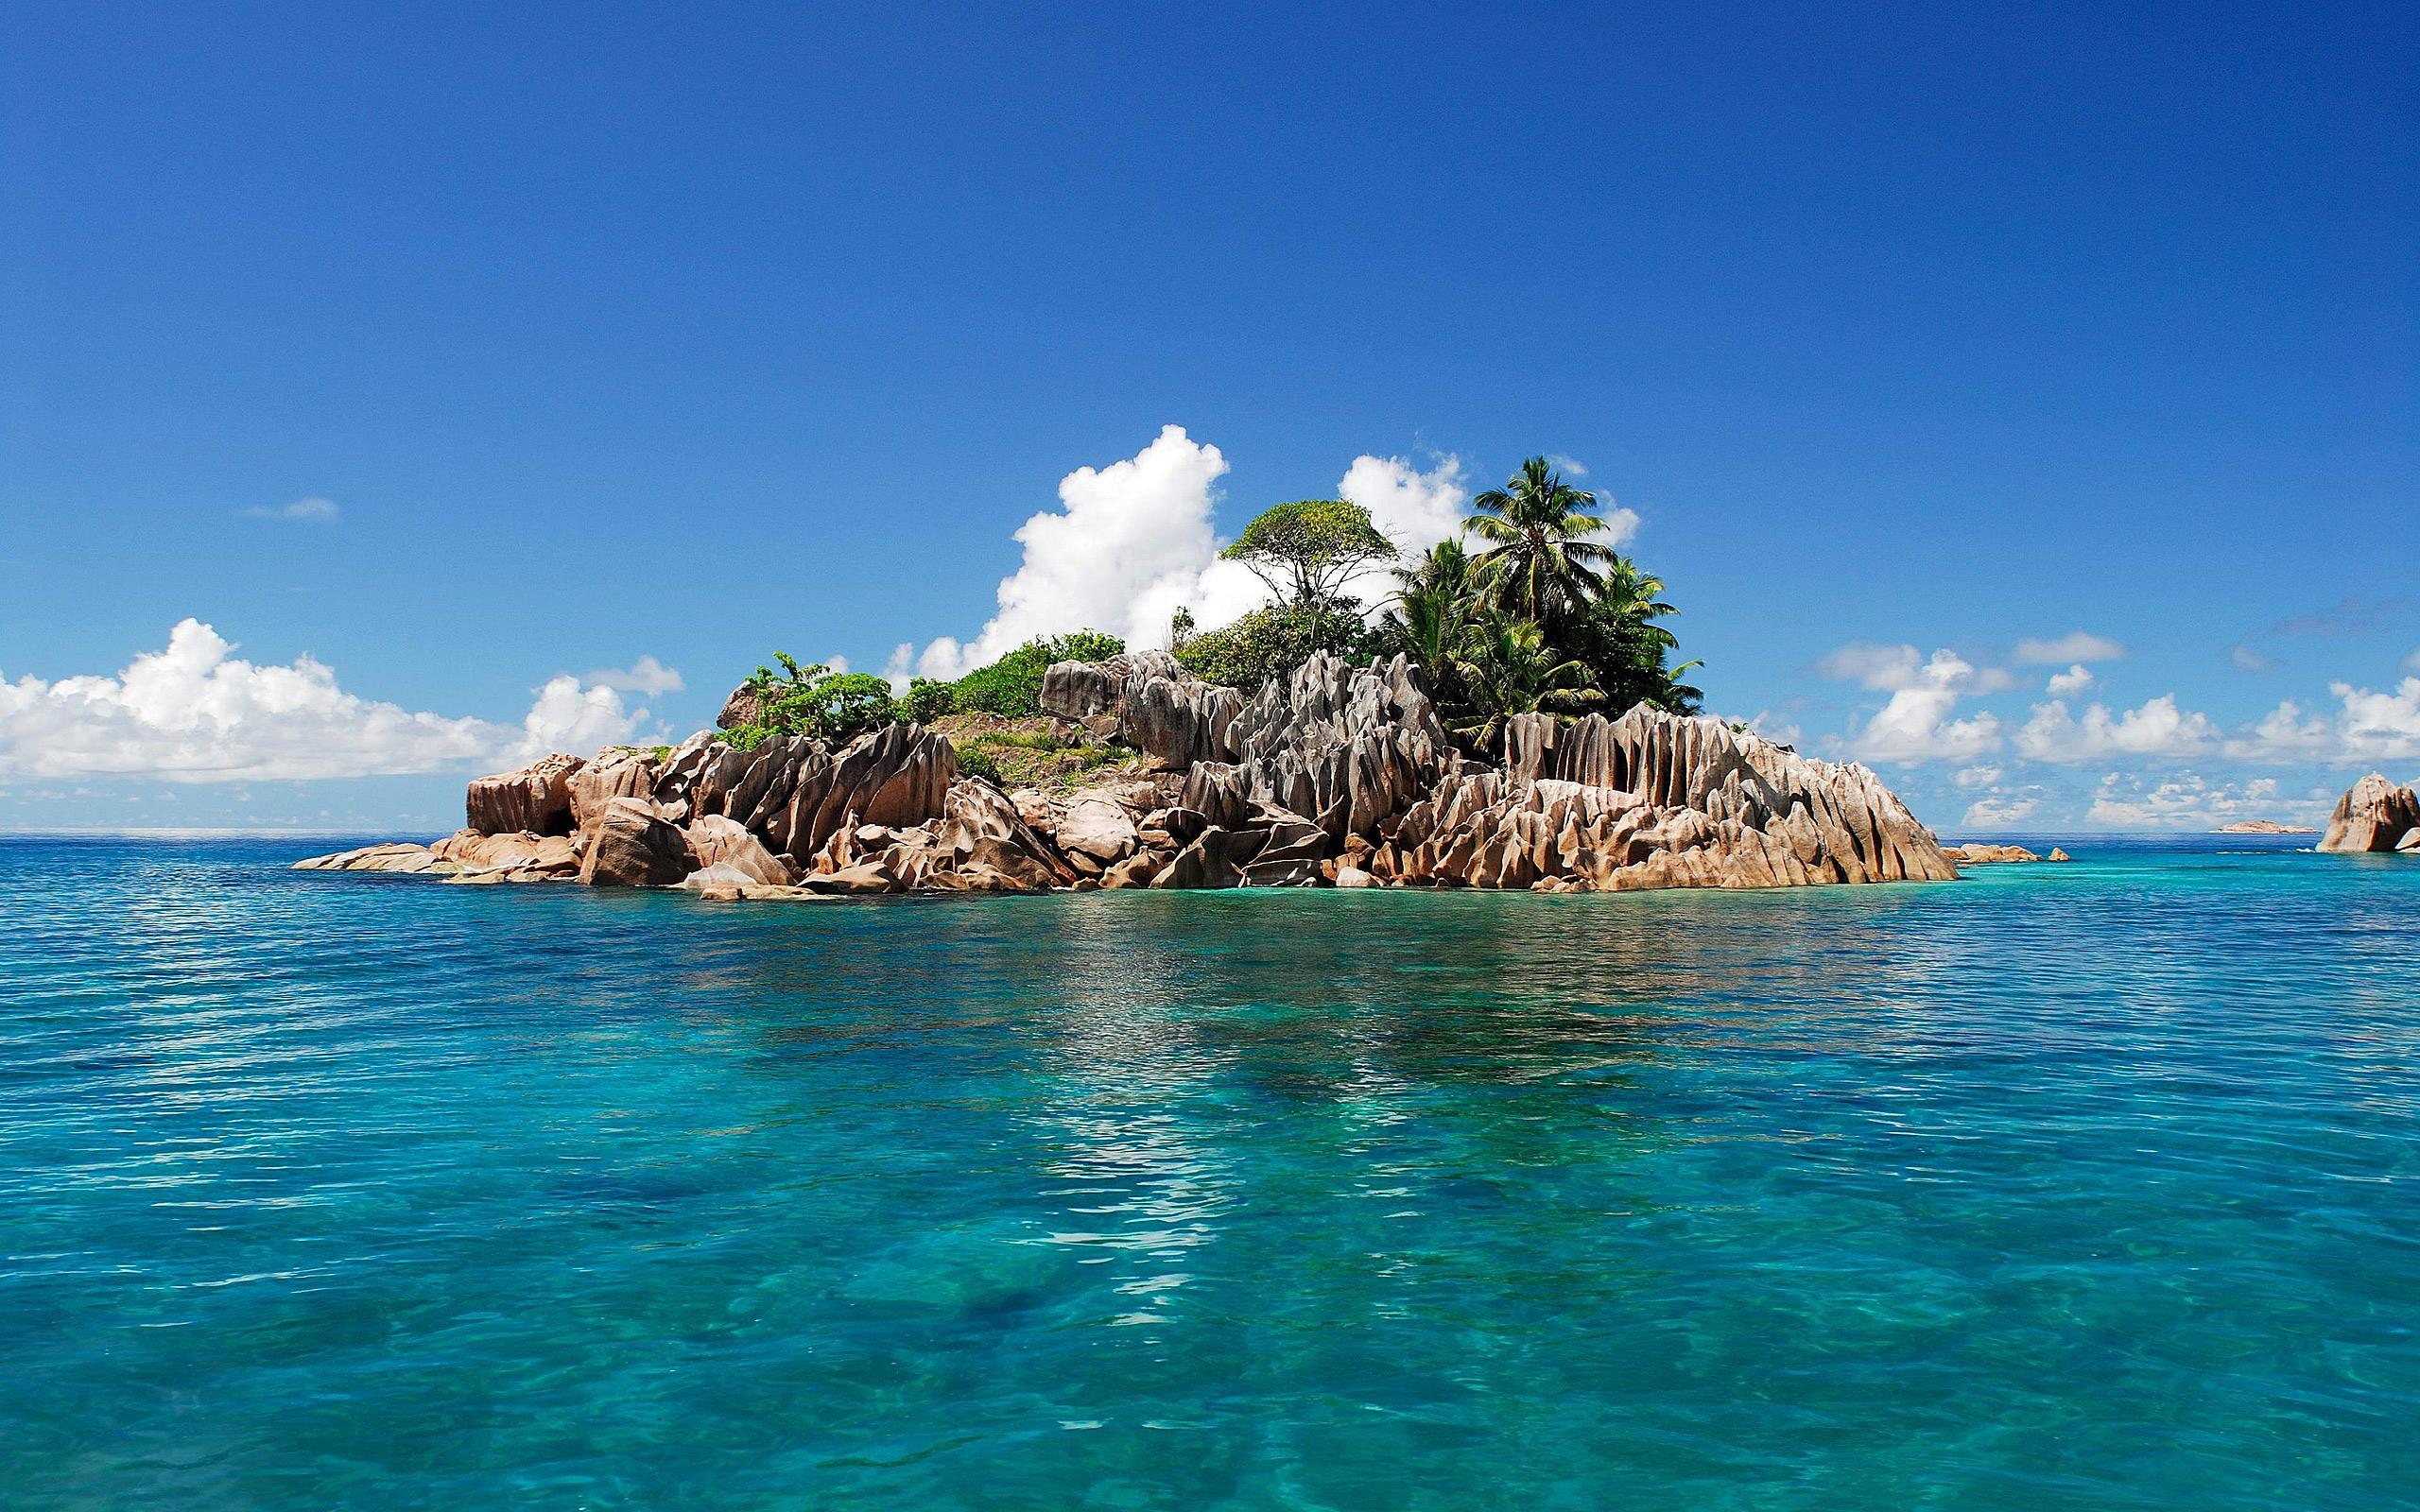 Beautiful Tropical Island Wallpaper Desktop Wallpaper with 2560x1600 2560x1600